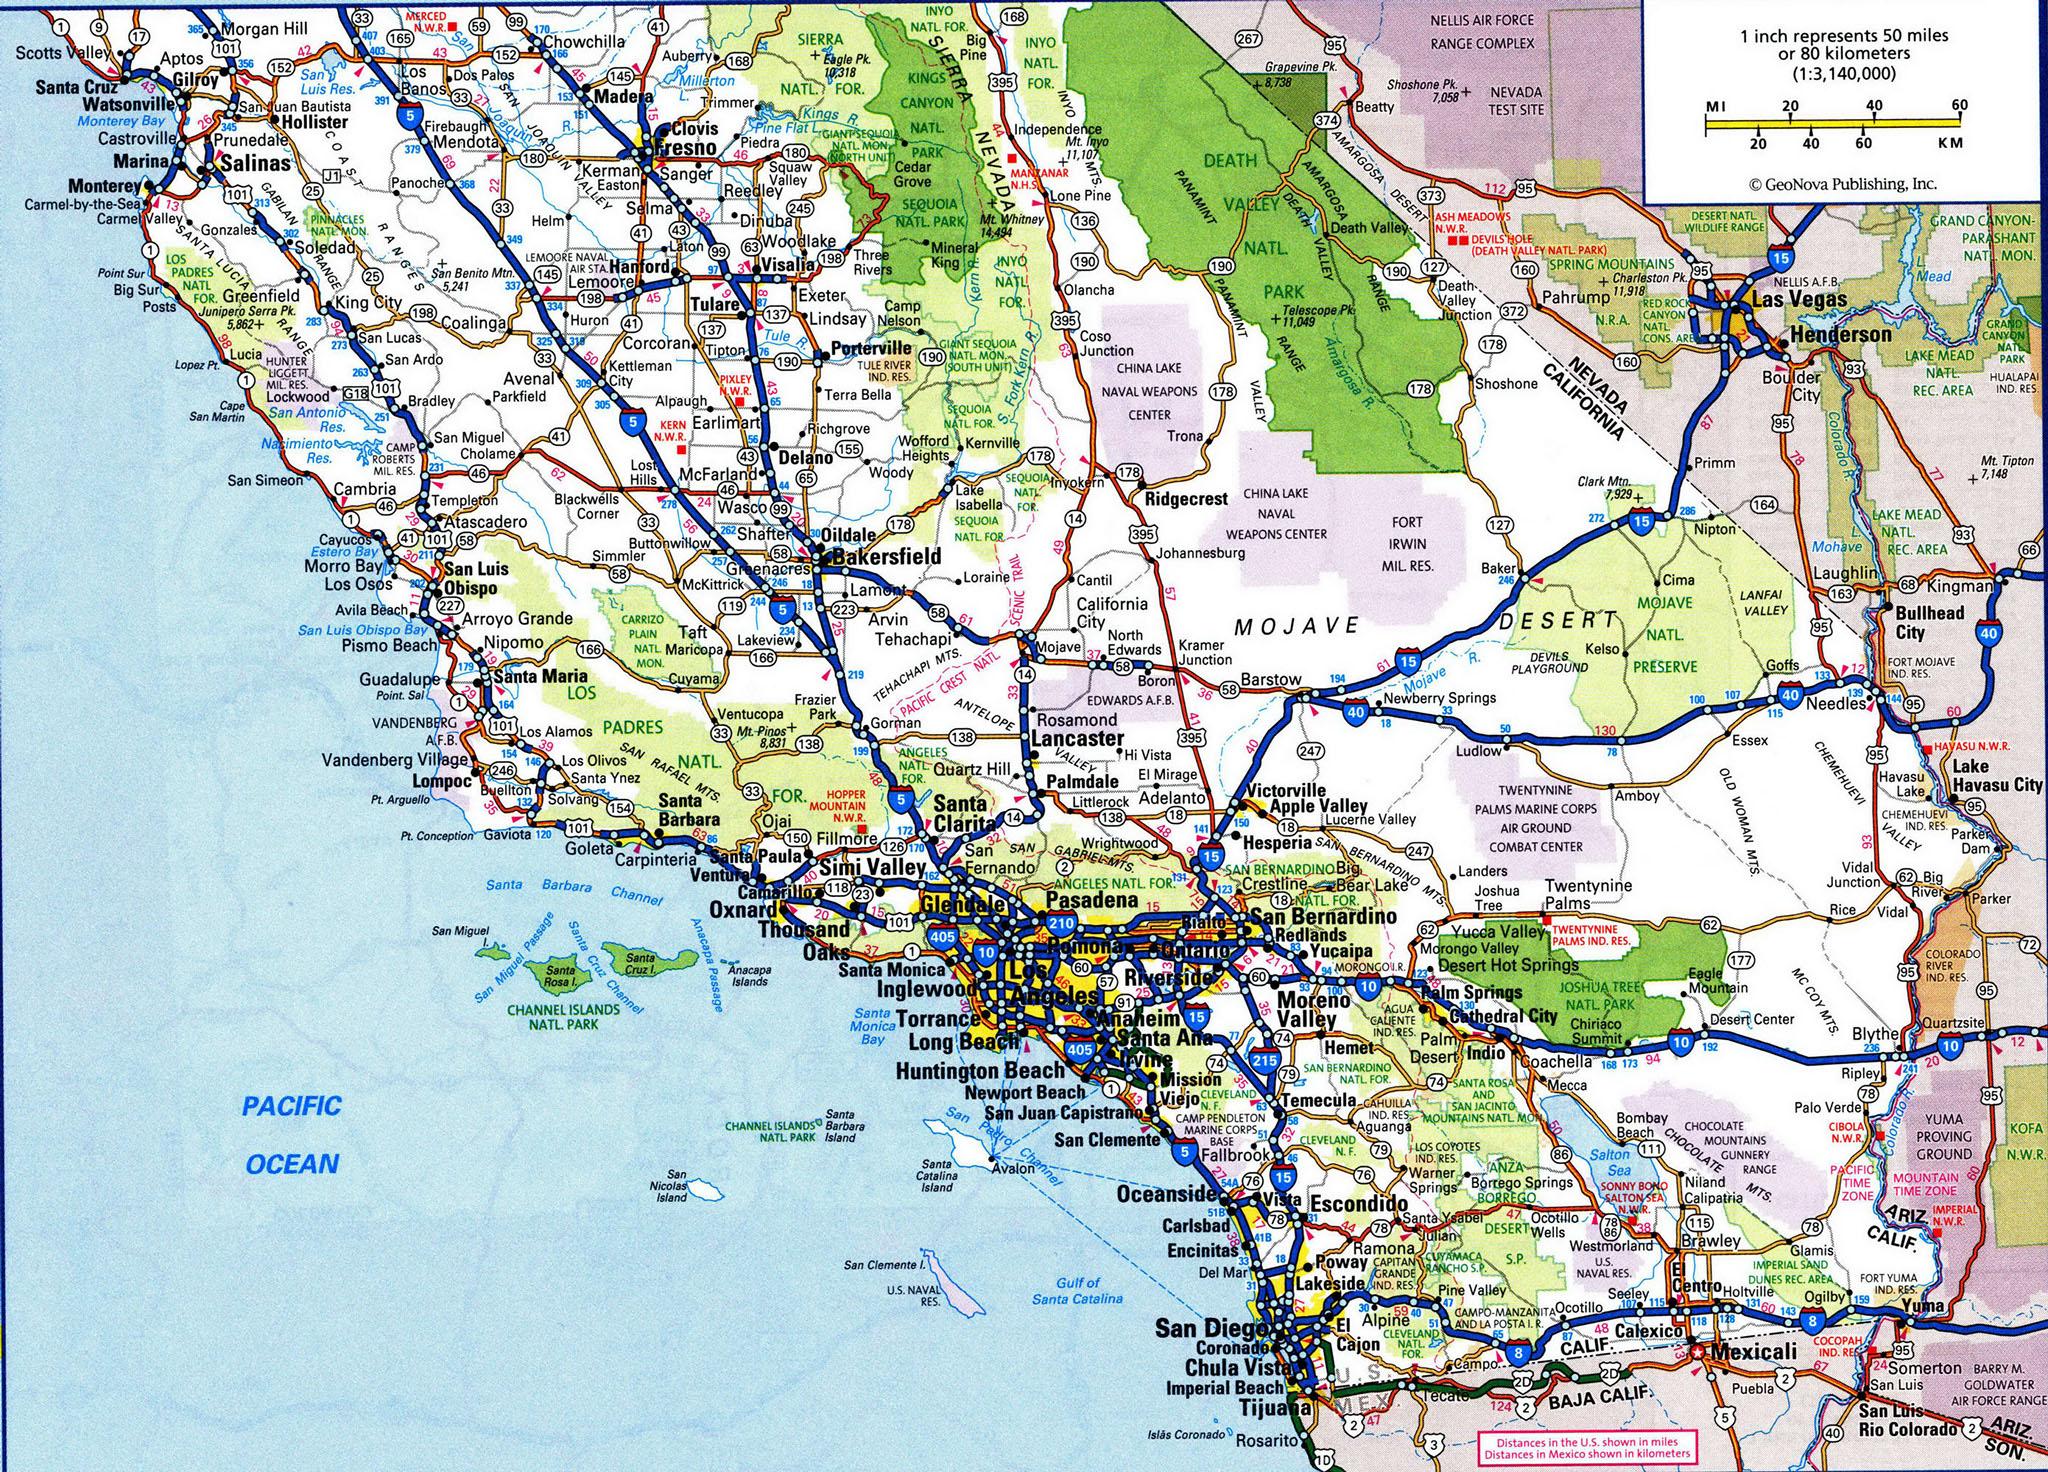 S Calif Google Maps California Road Map Of Central California - Central California Road Map